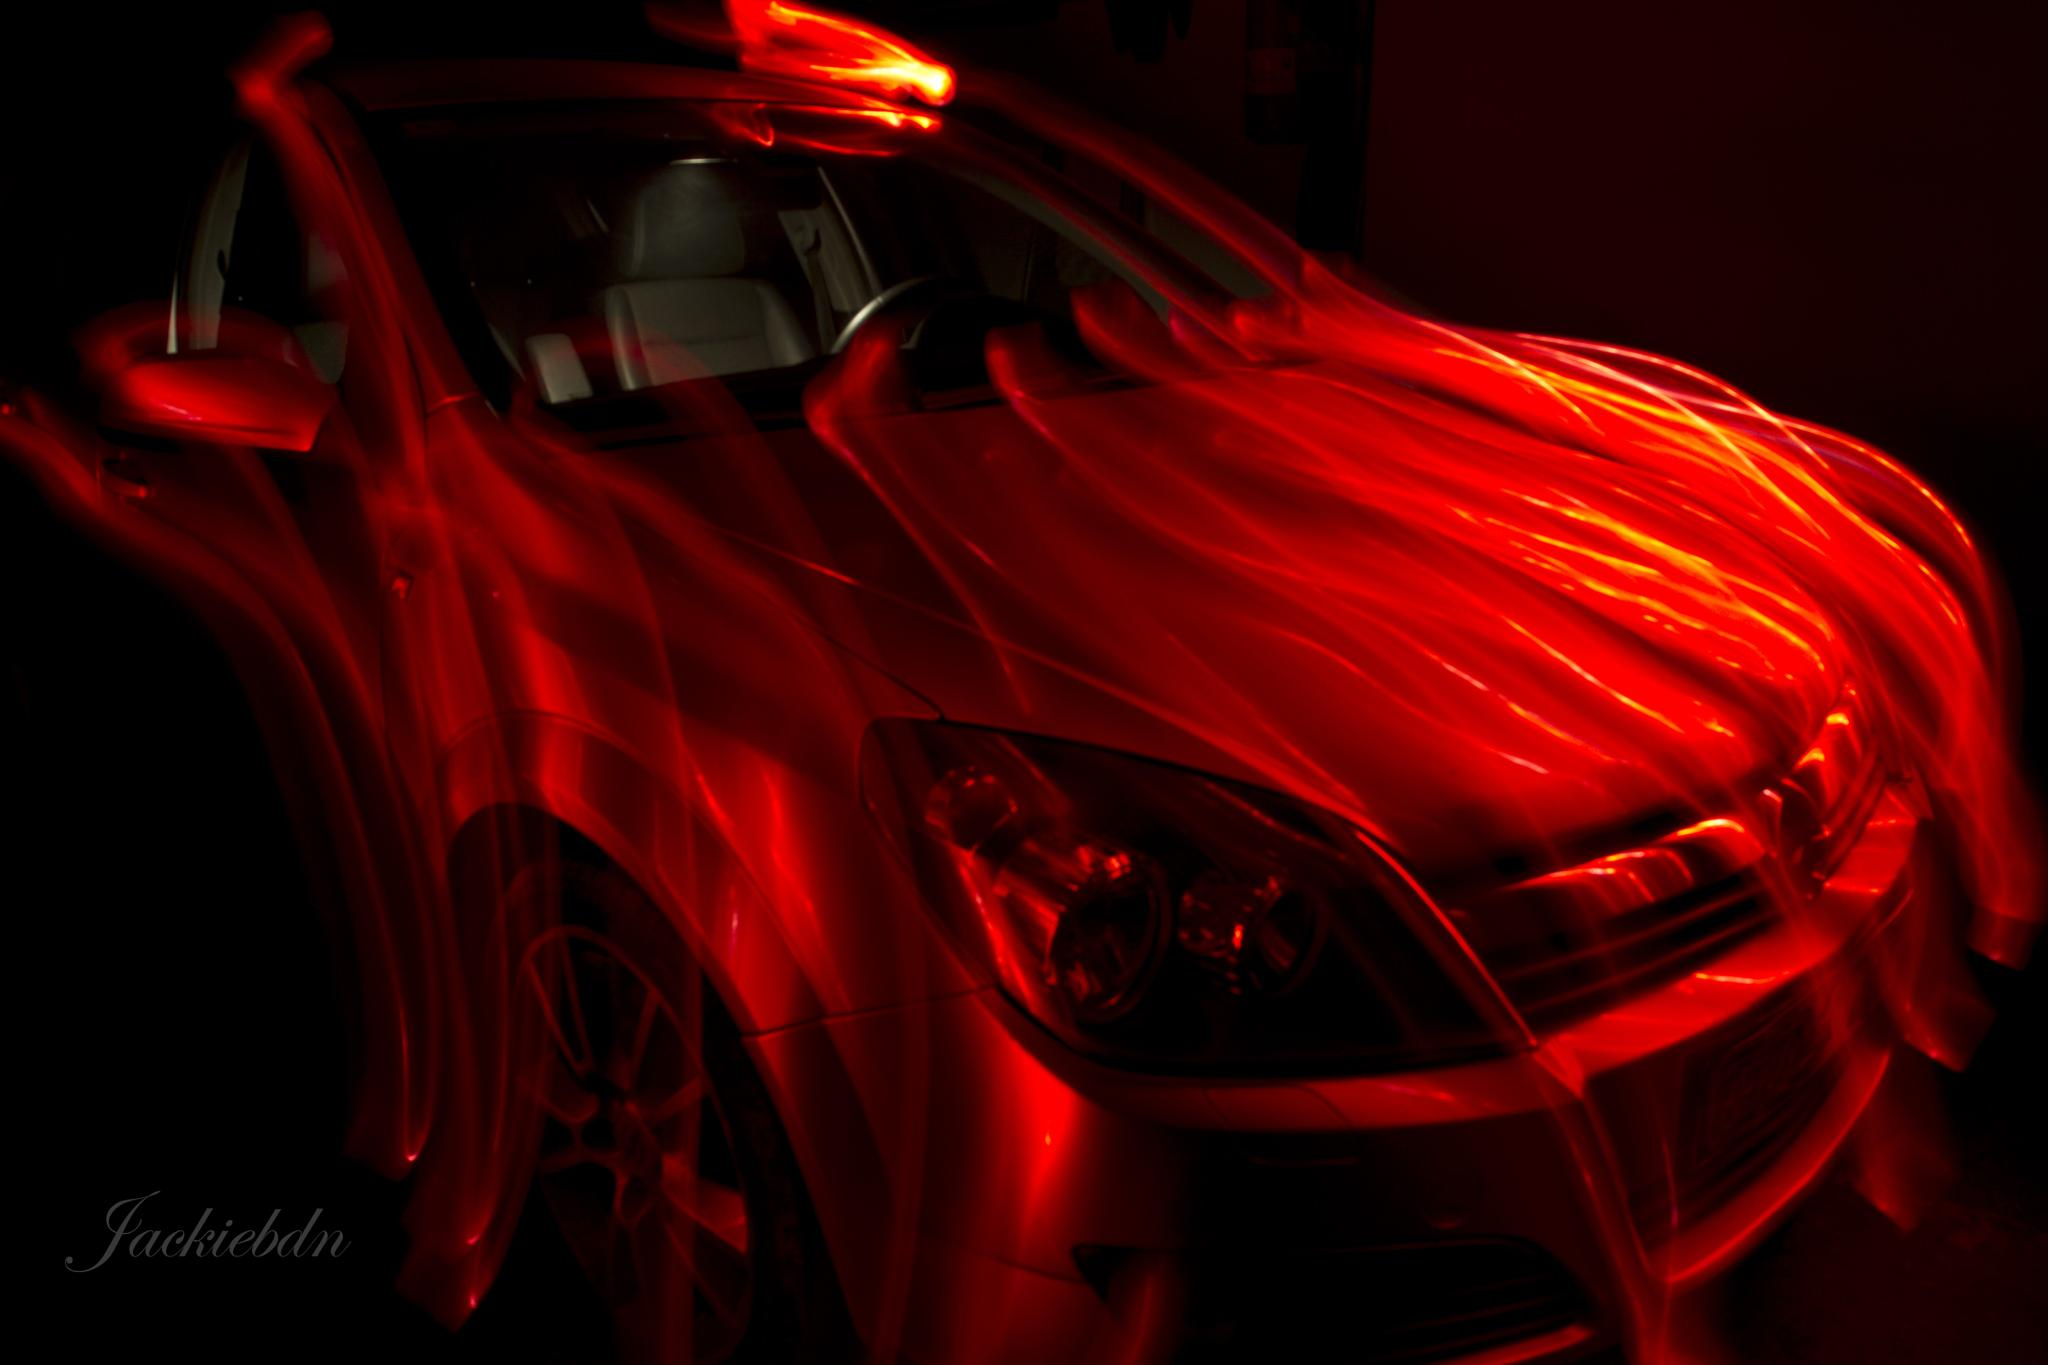 Evil Car by Jackiebdn